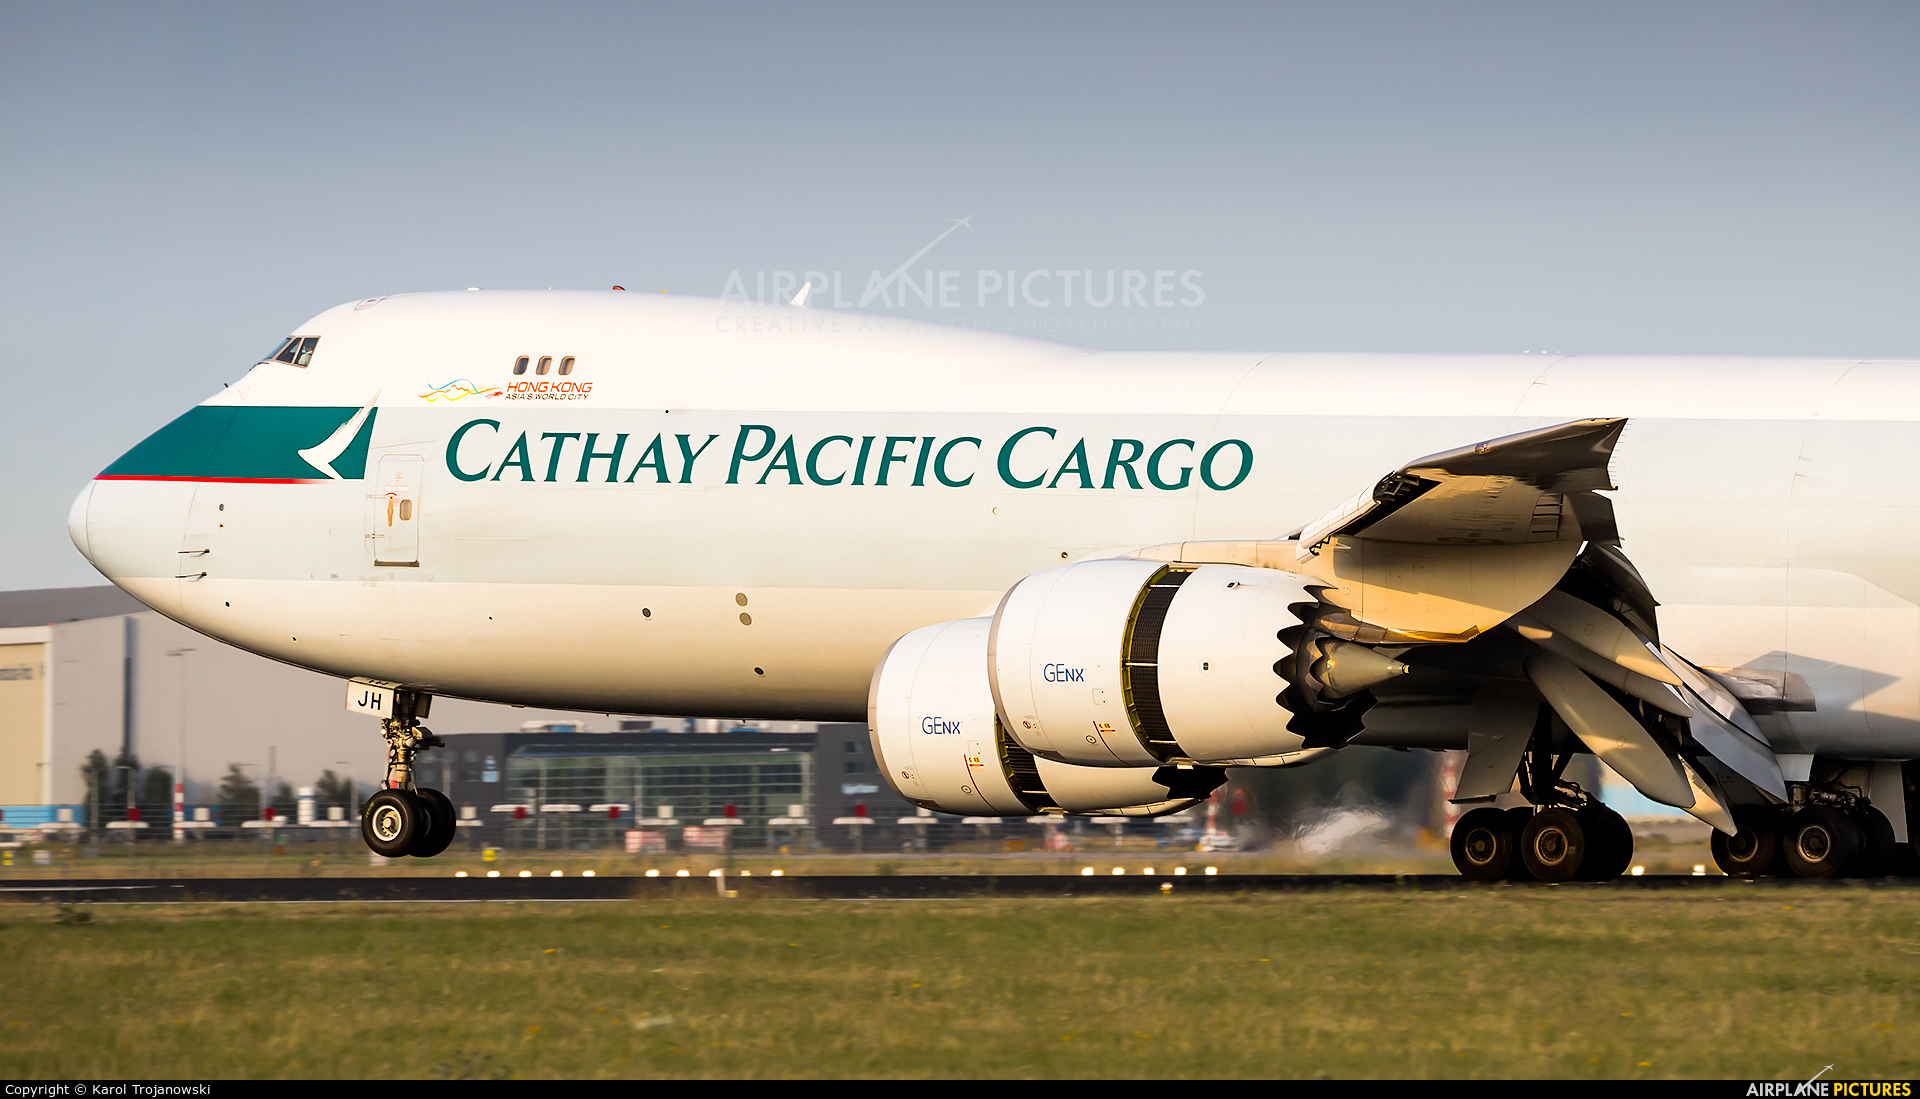 Cathay Pacific Cargo B-LJH aircraft at Amsterdam - Schiphol